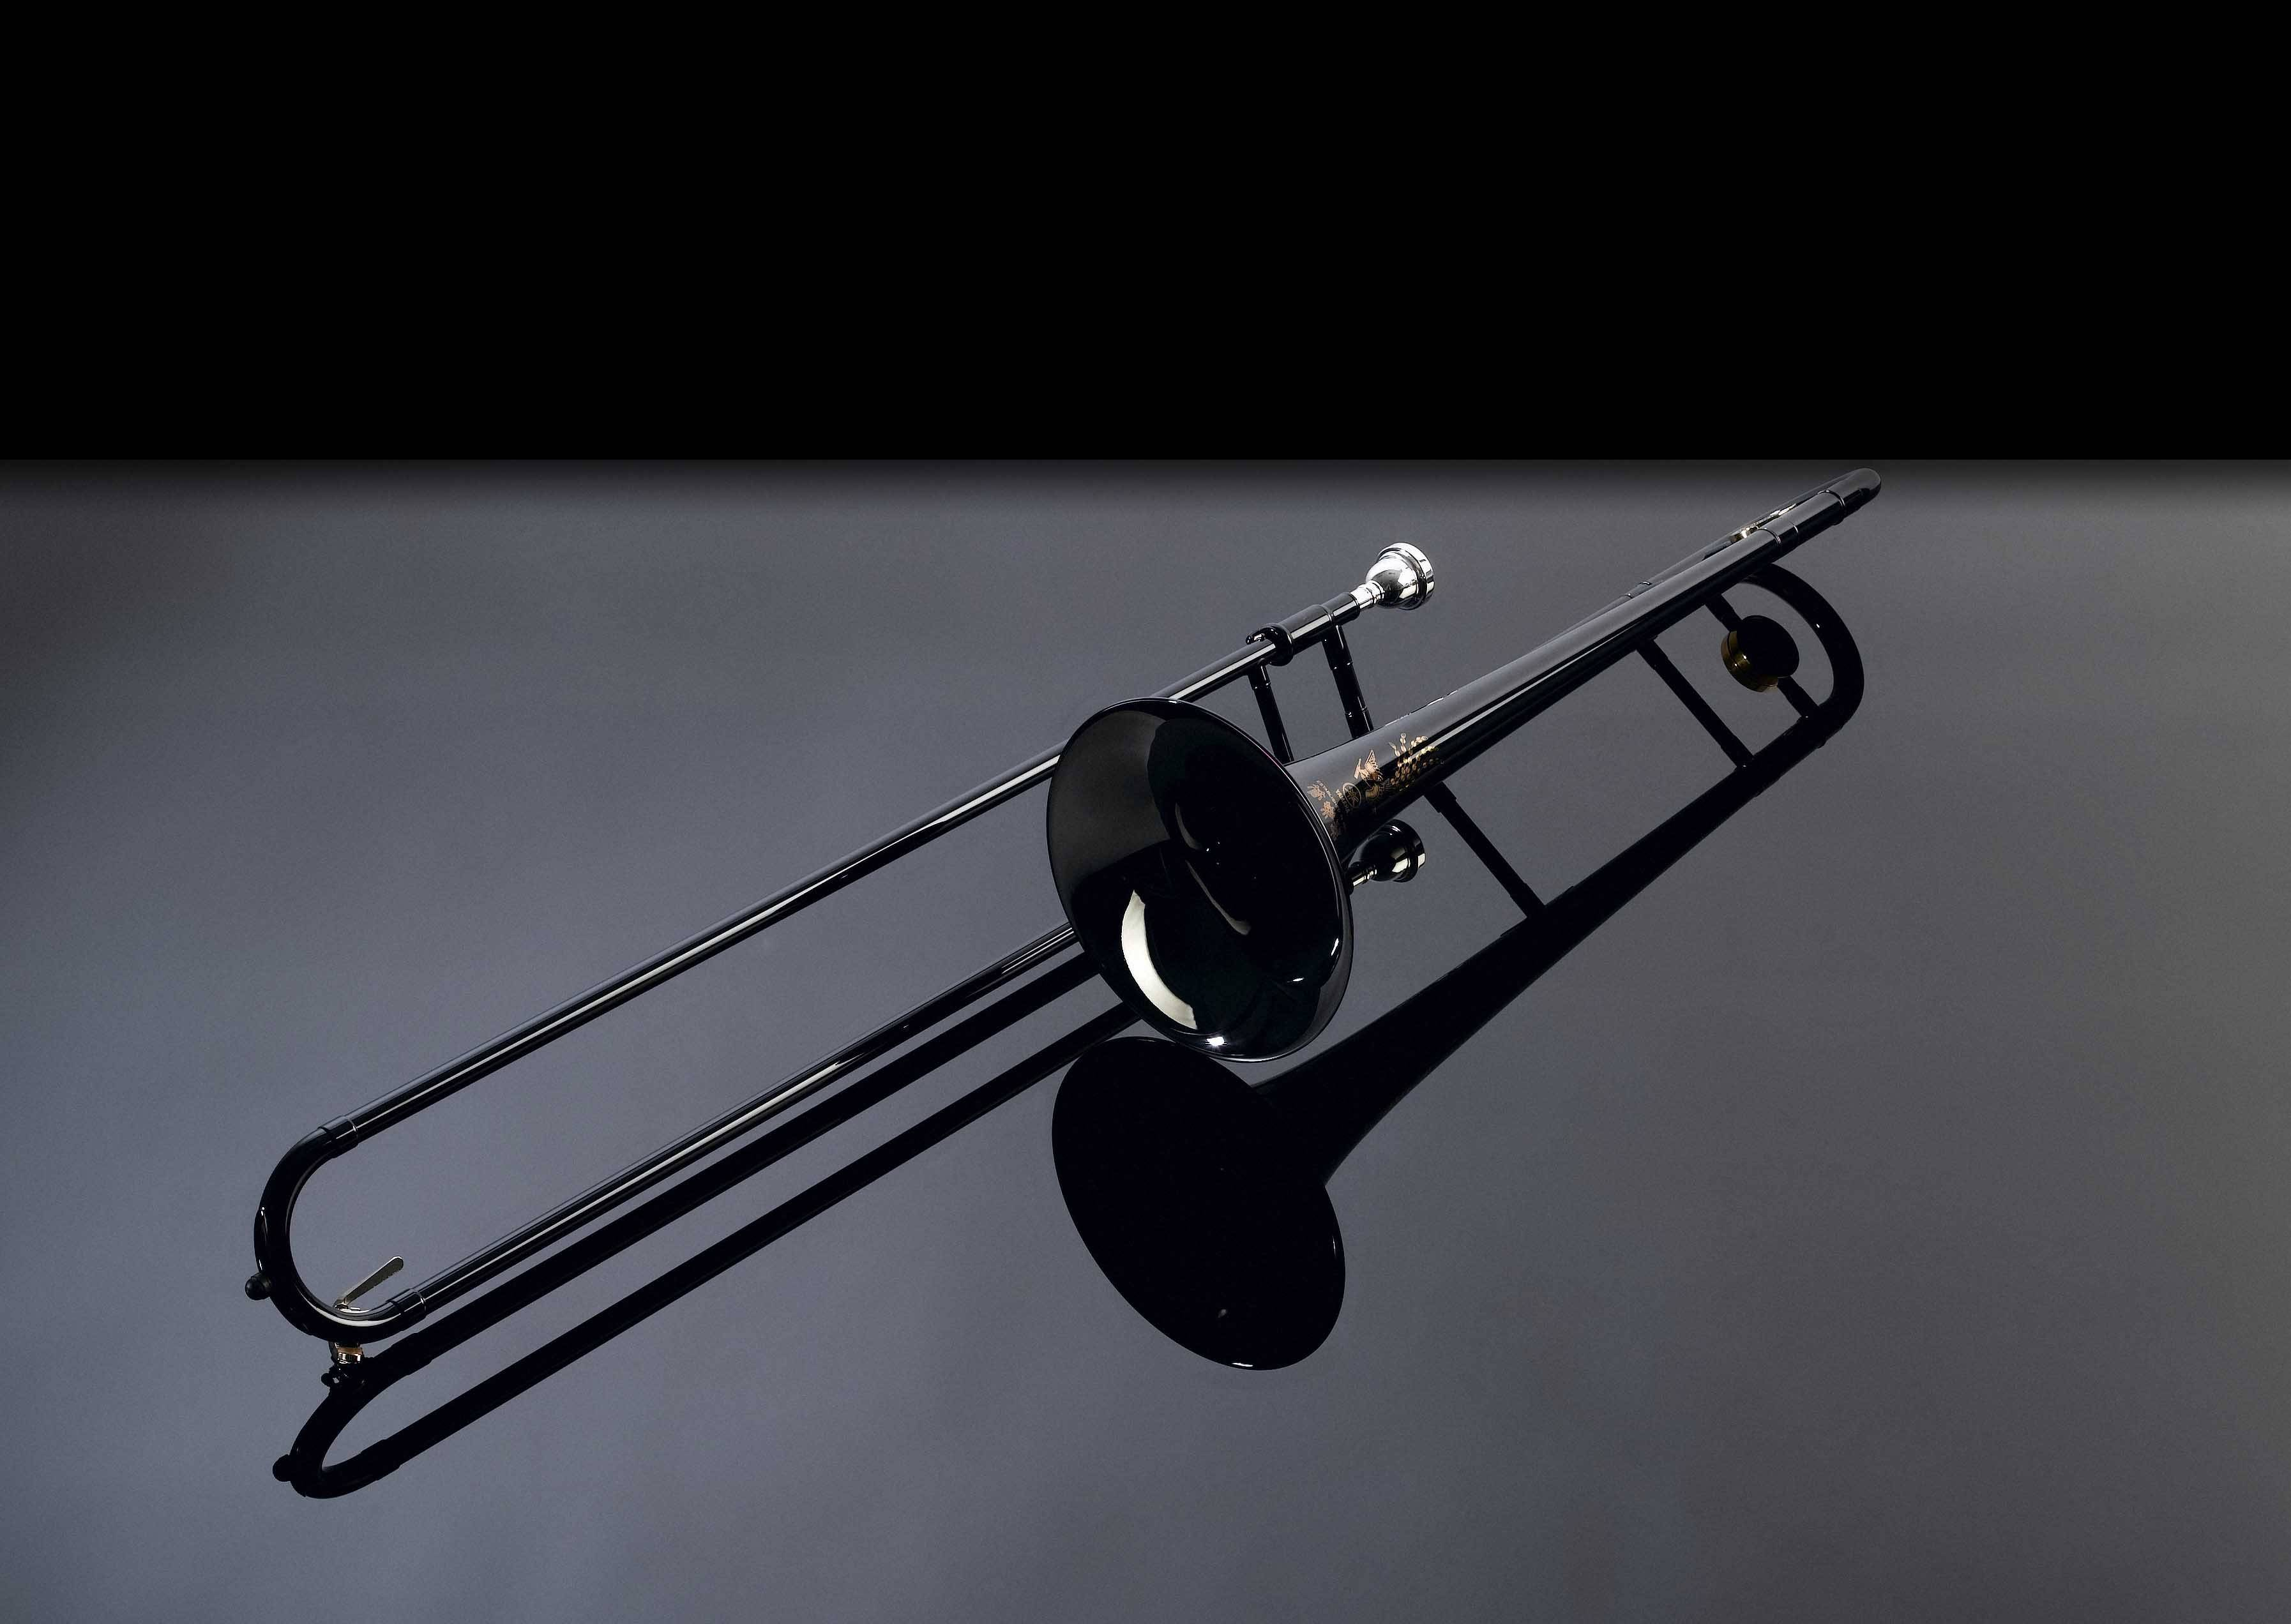 instruments jazz 3588a—2544 wallpaper 2172419